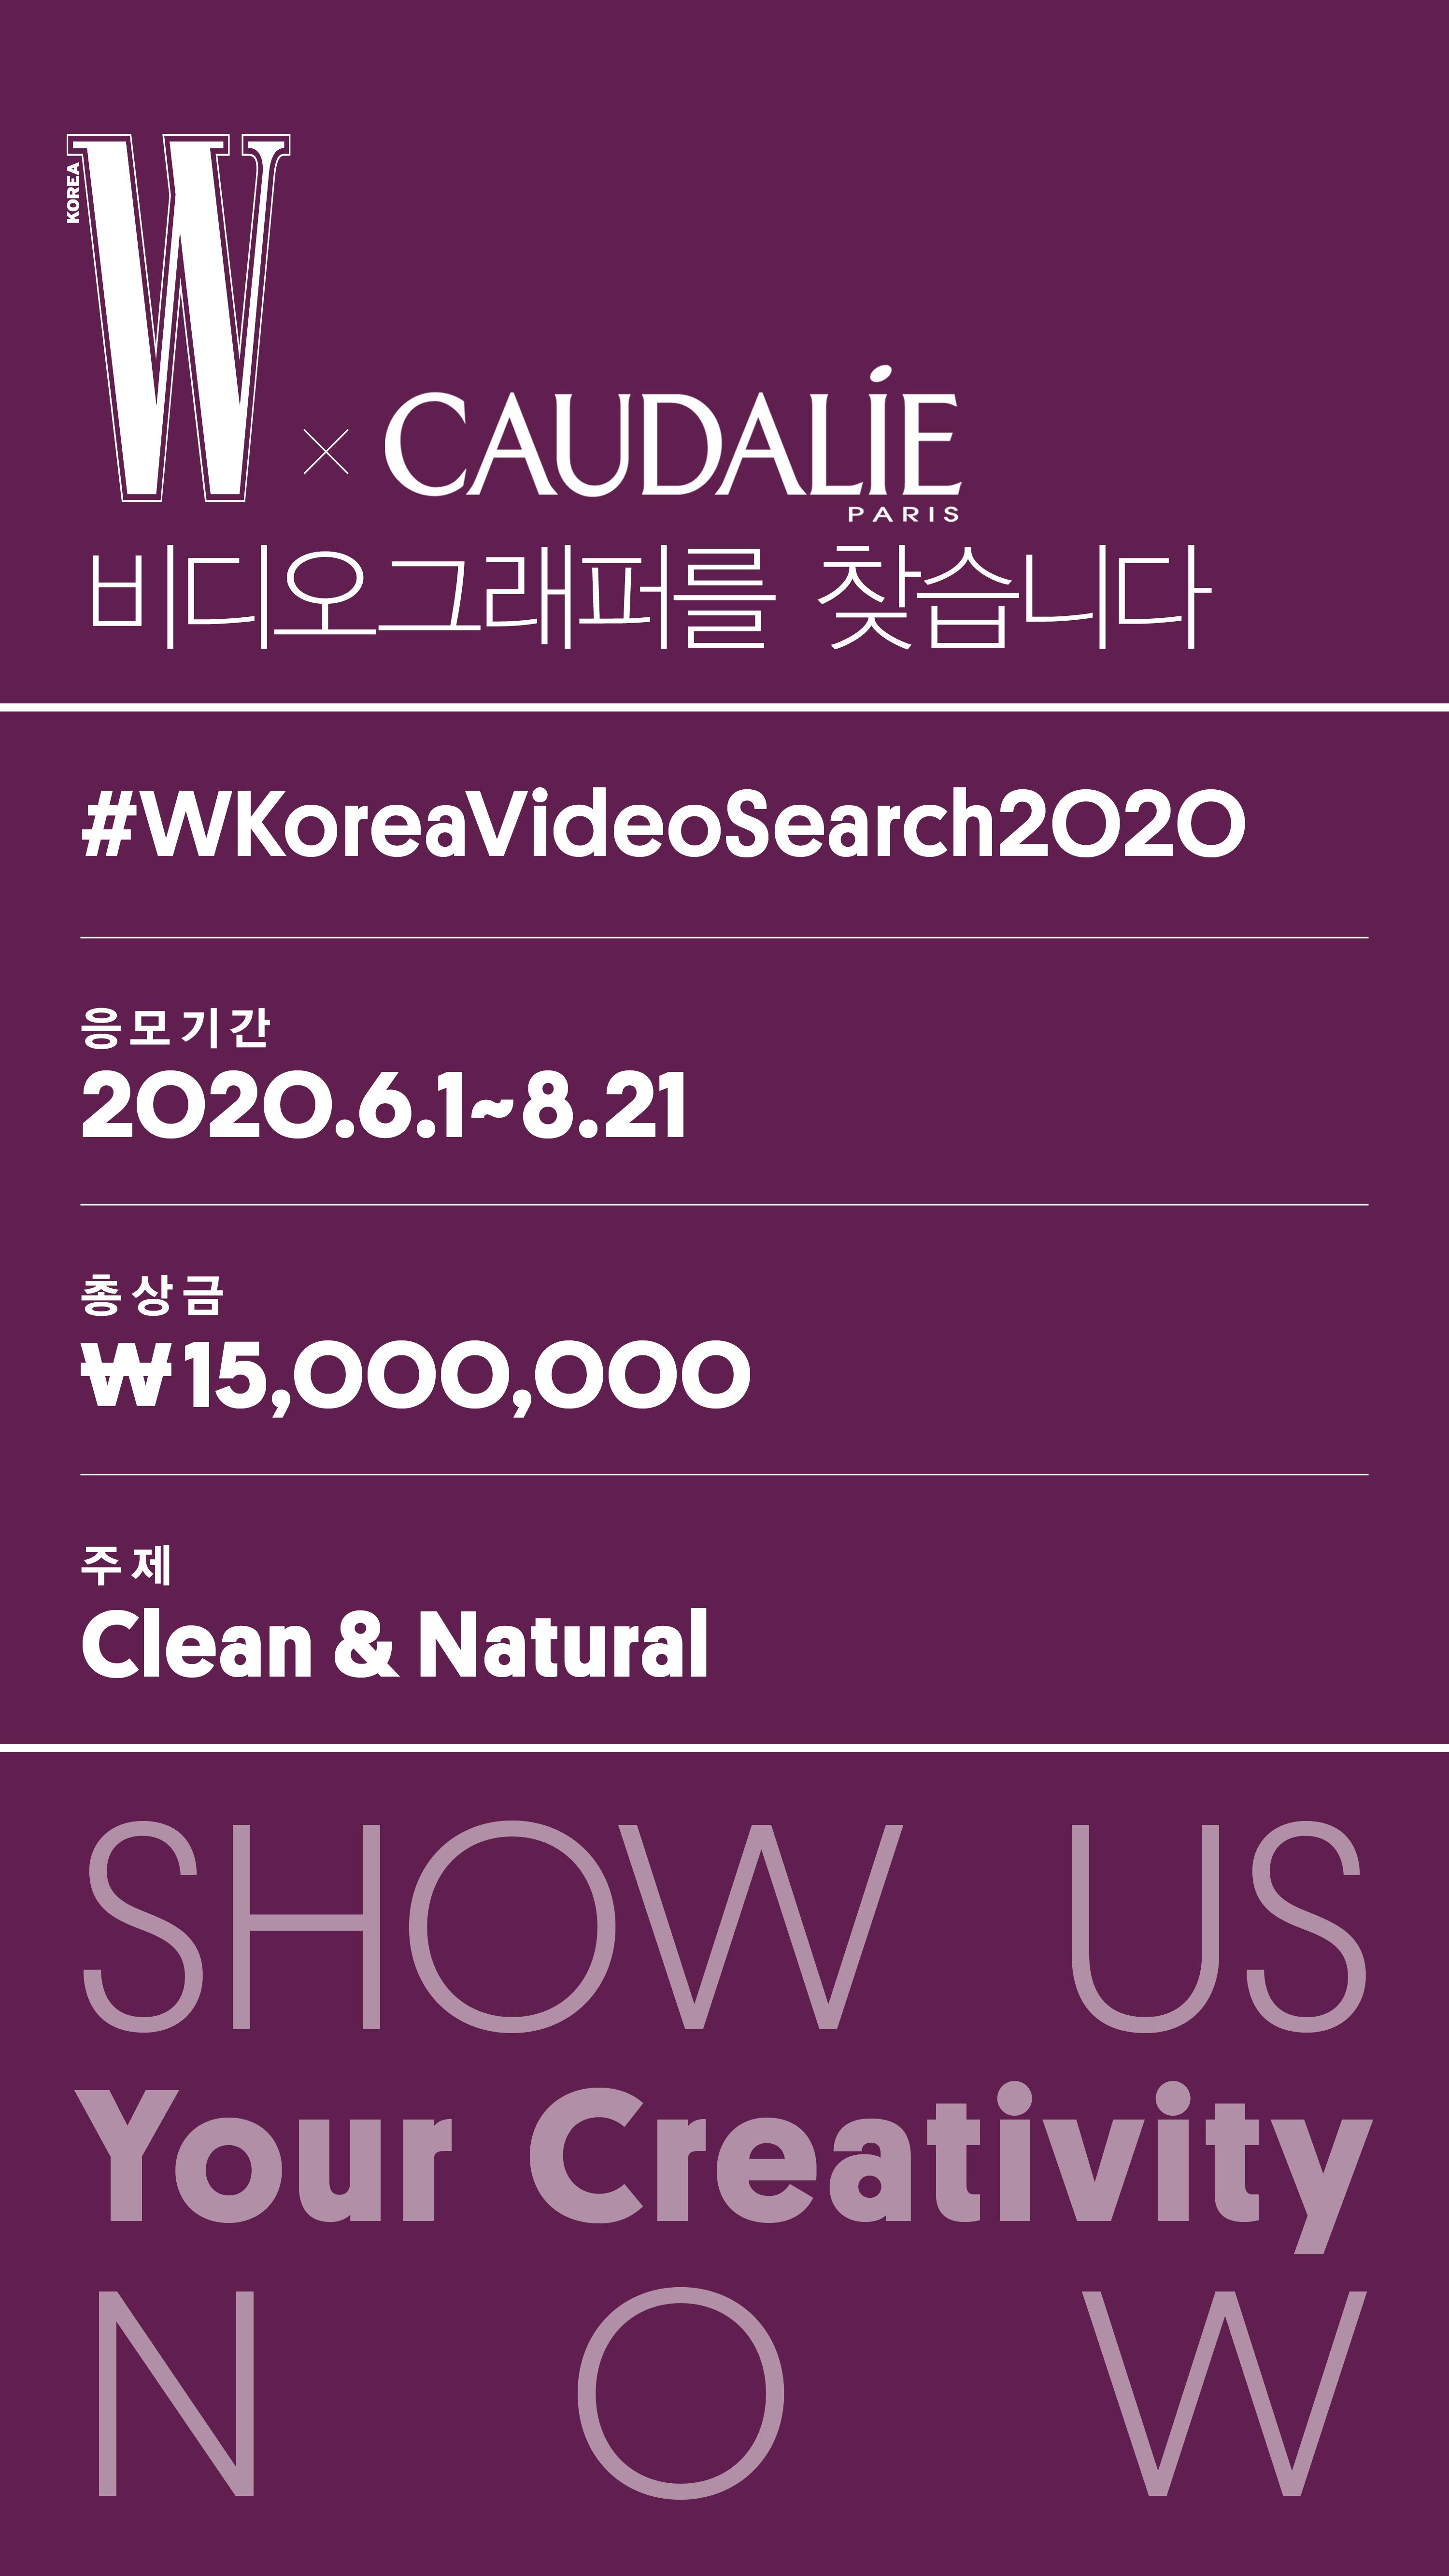 2020WKoreaVideoSearch2020